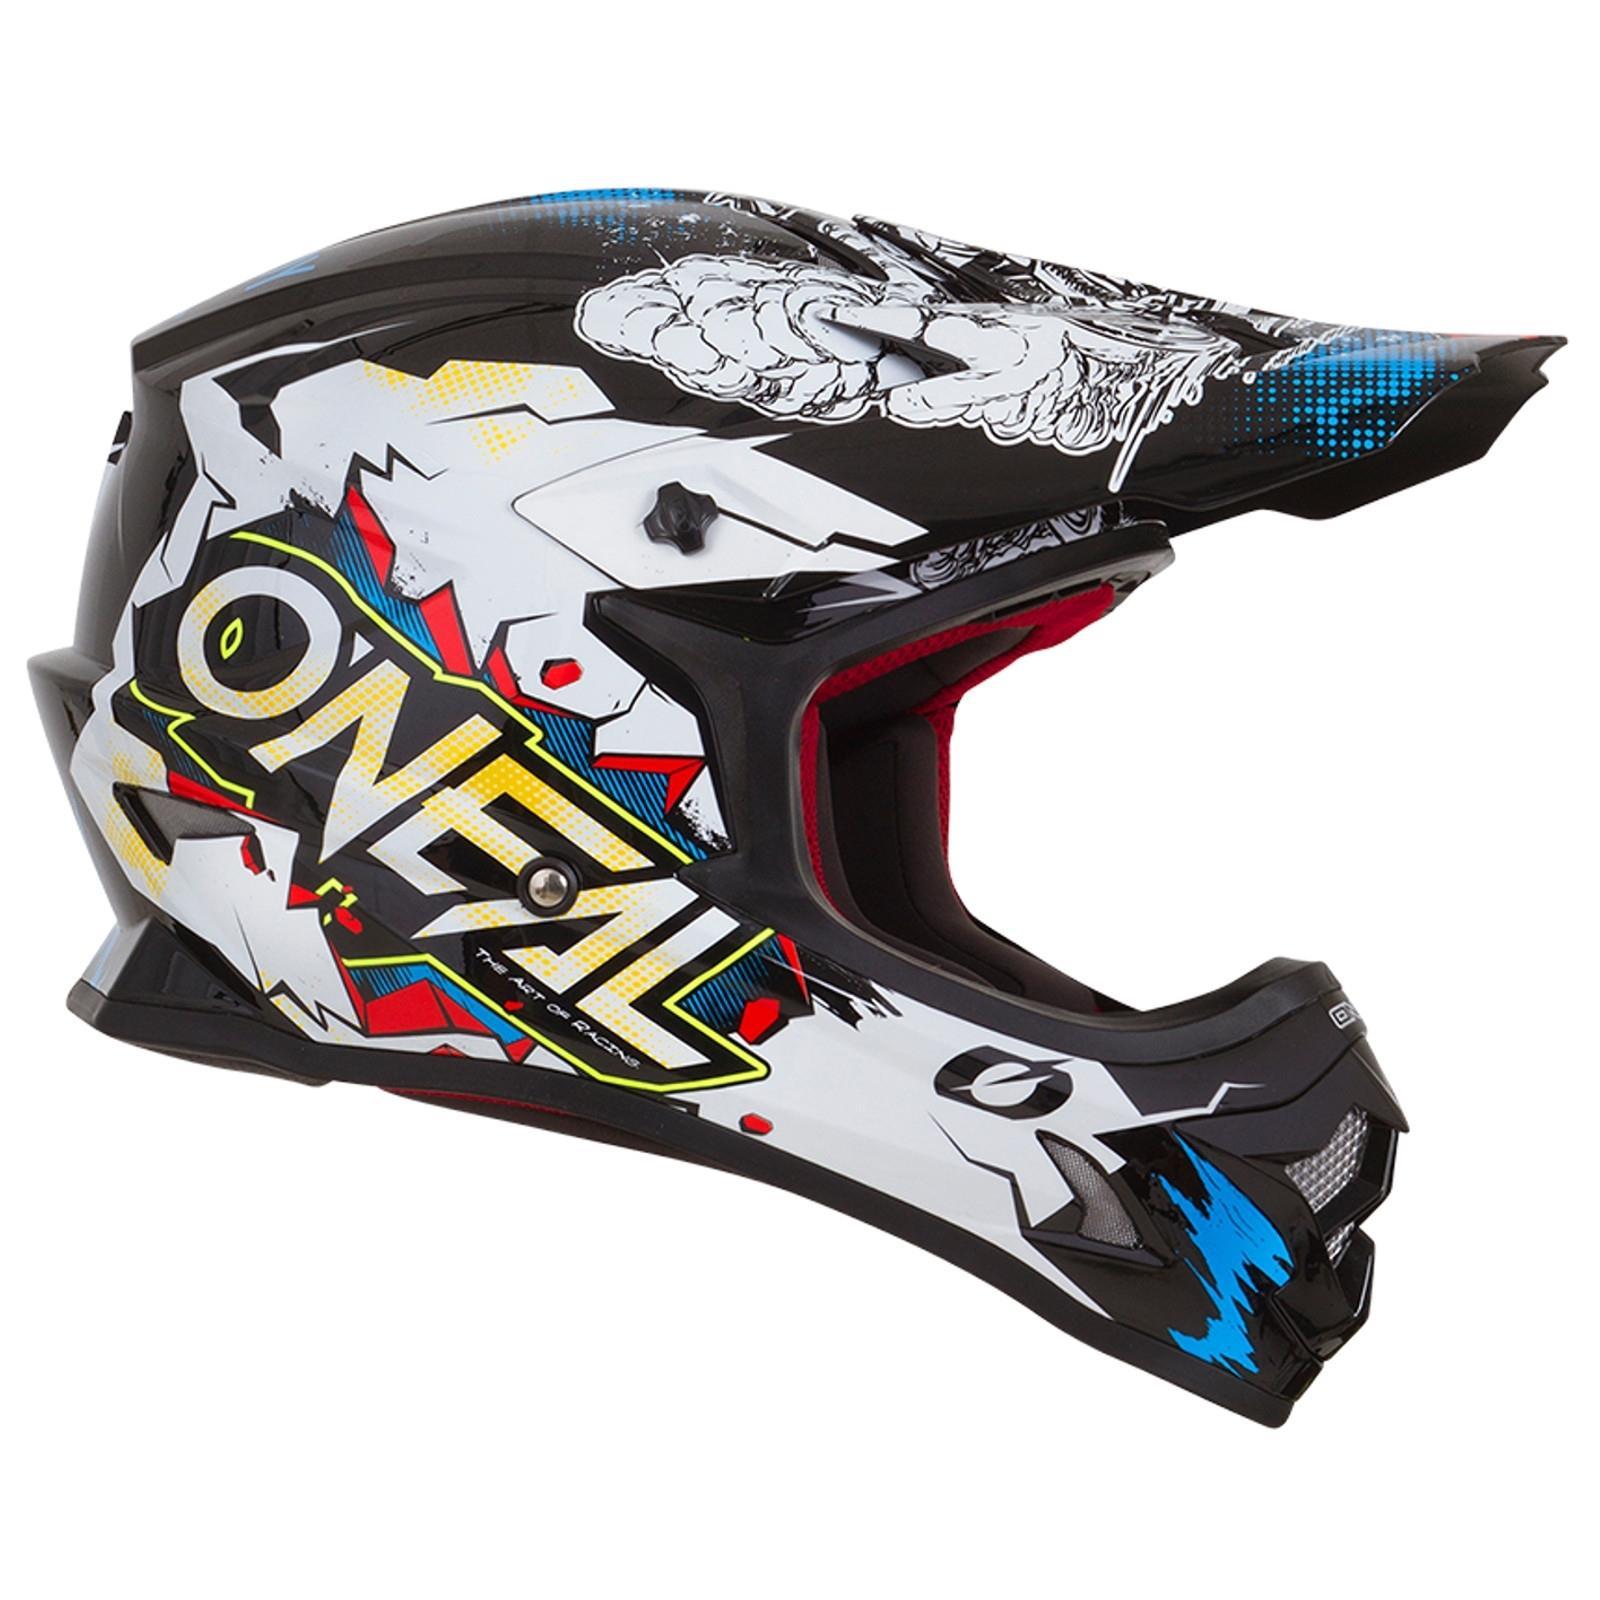 ONeal-Motocross-casco-MX-ENDURO-MOTO-BICI-FUORISTRADA-CROSS-Series-Adventure miniatura 55